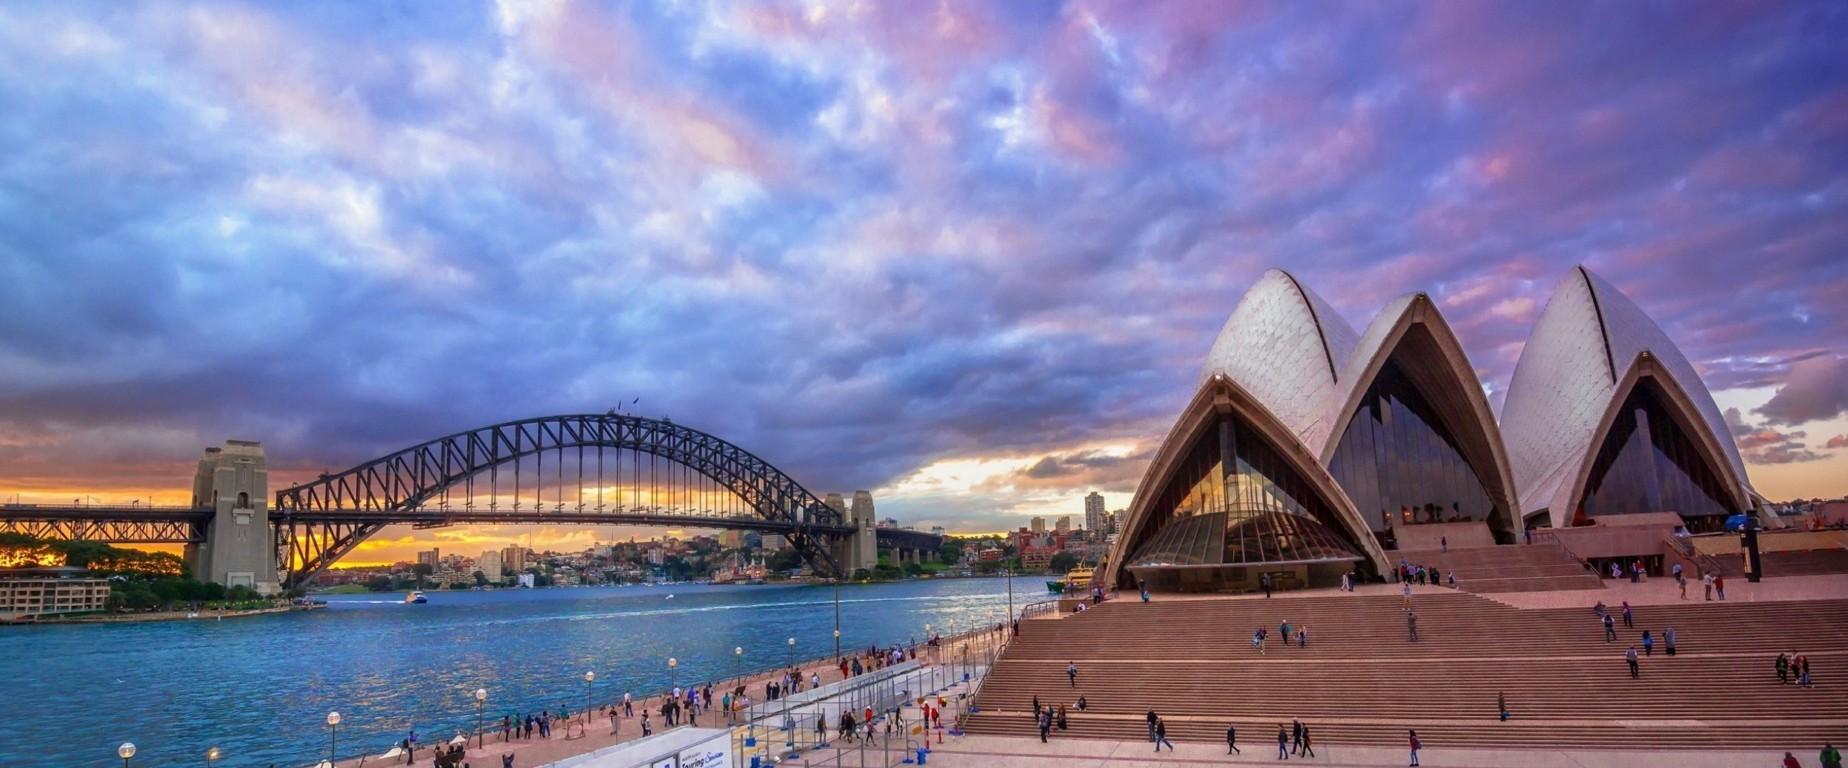 Man Made Sydney Cities Hd Wallpaper Background Australia